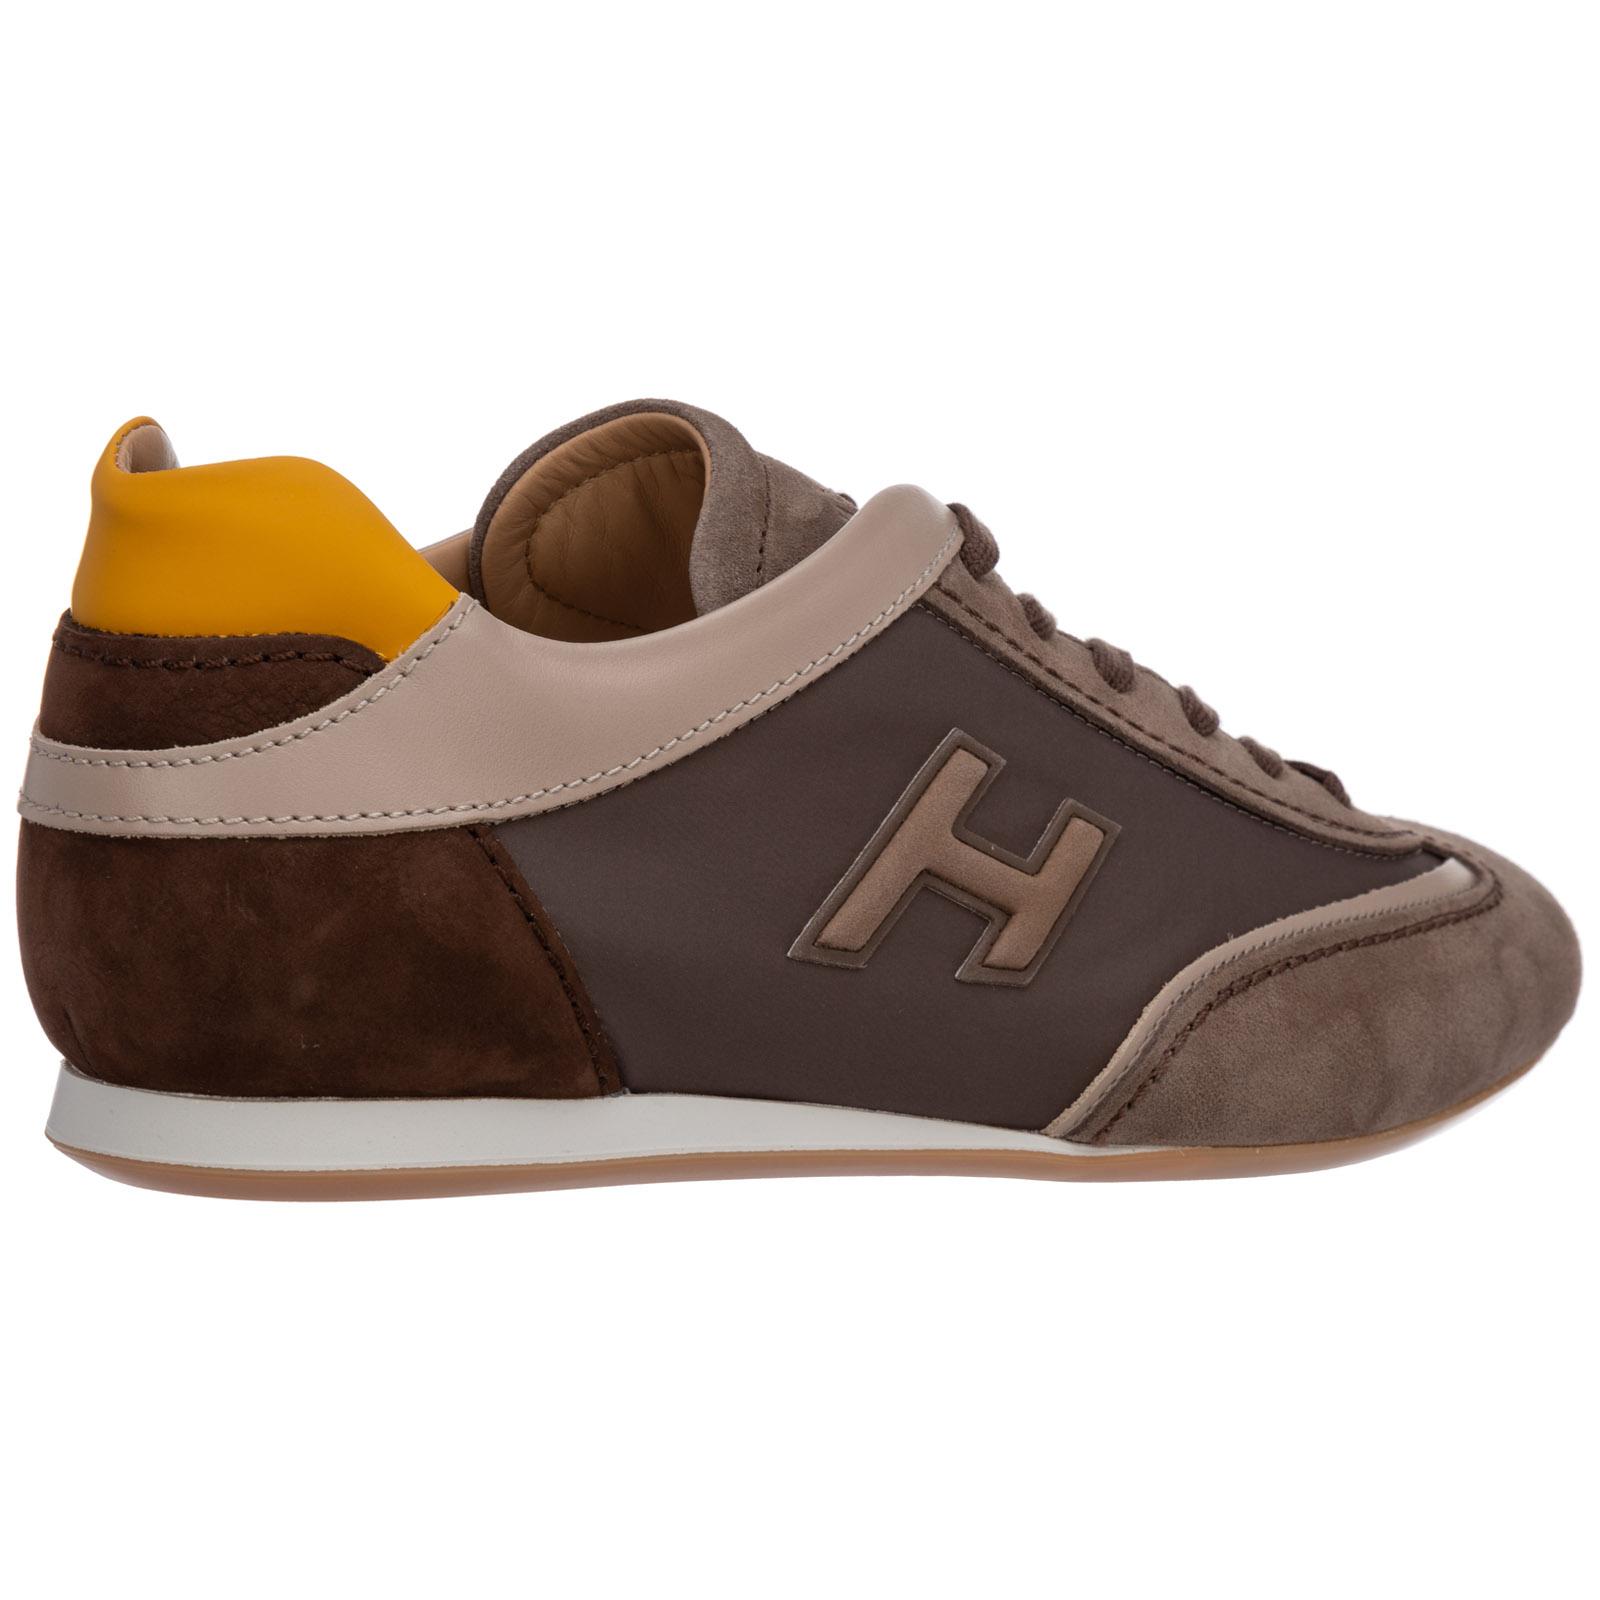 Scarpe sneakers uomo olympia